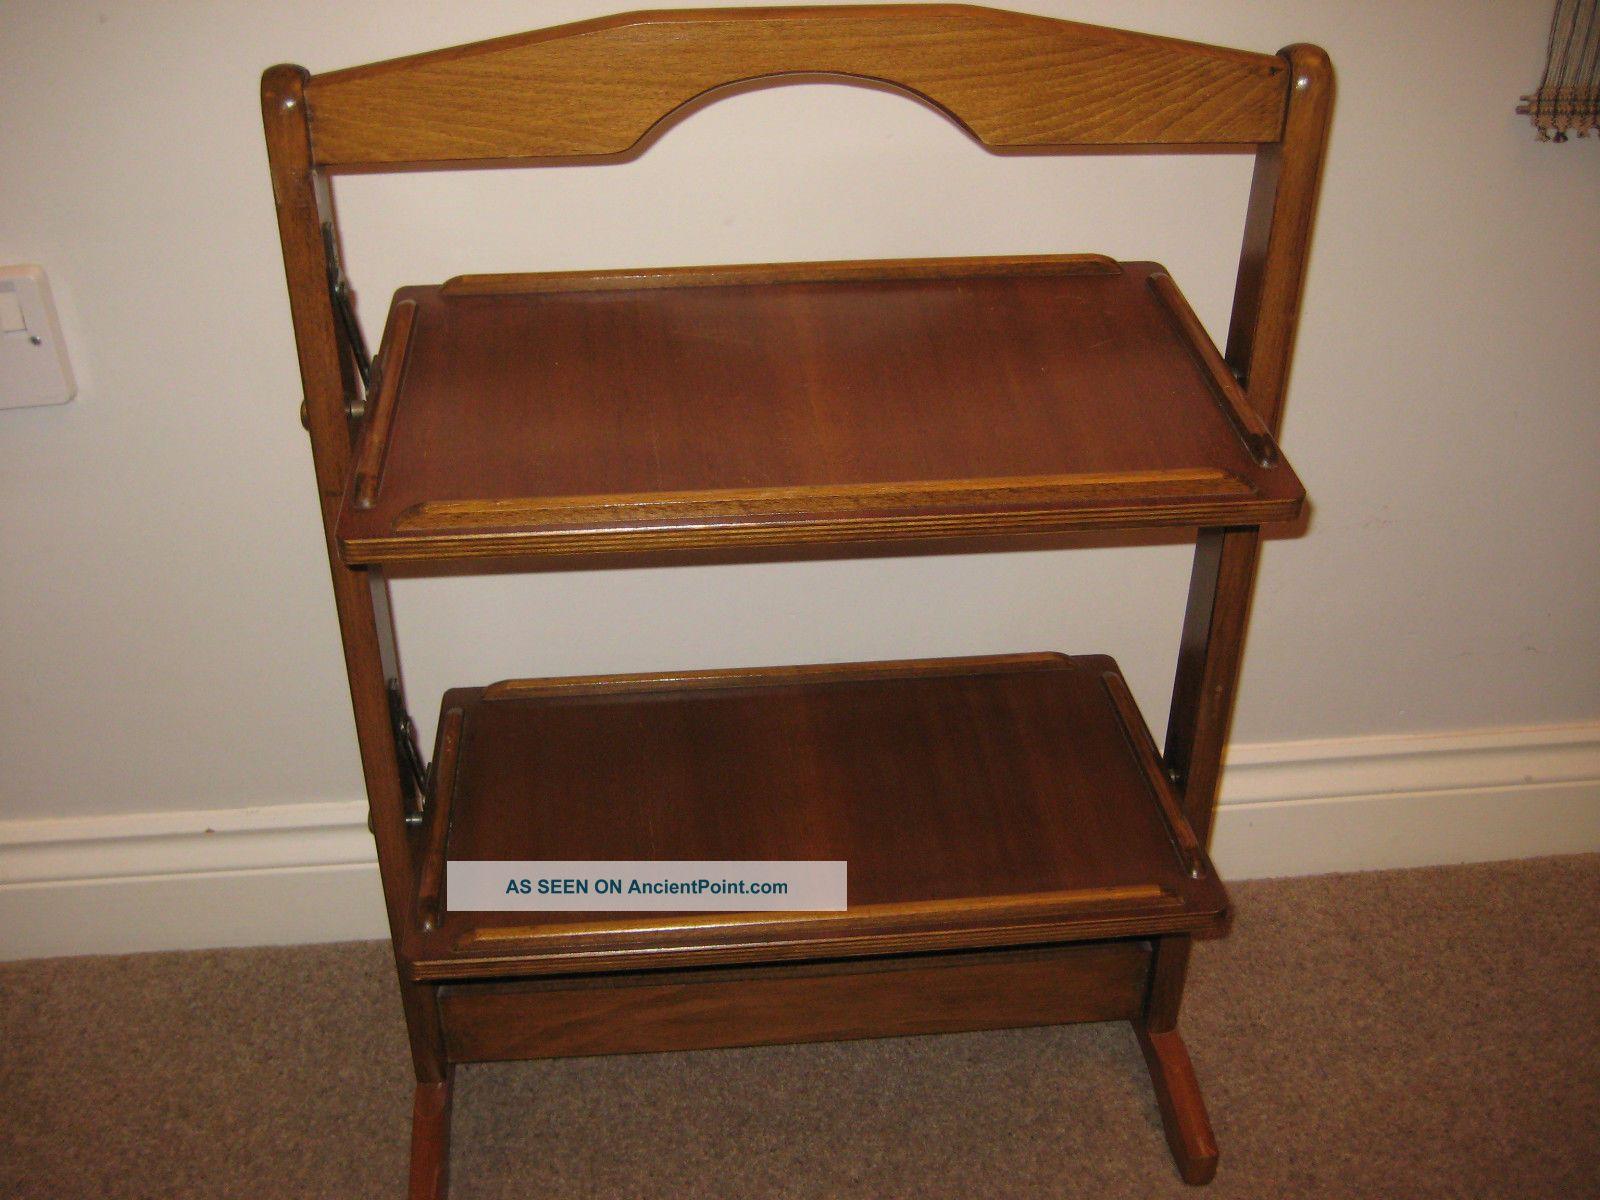 Vintage Elegant Wooden 2 Tier Folding Cake Stand. Stands photo